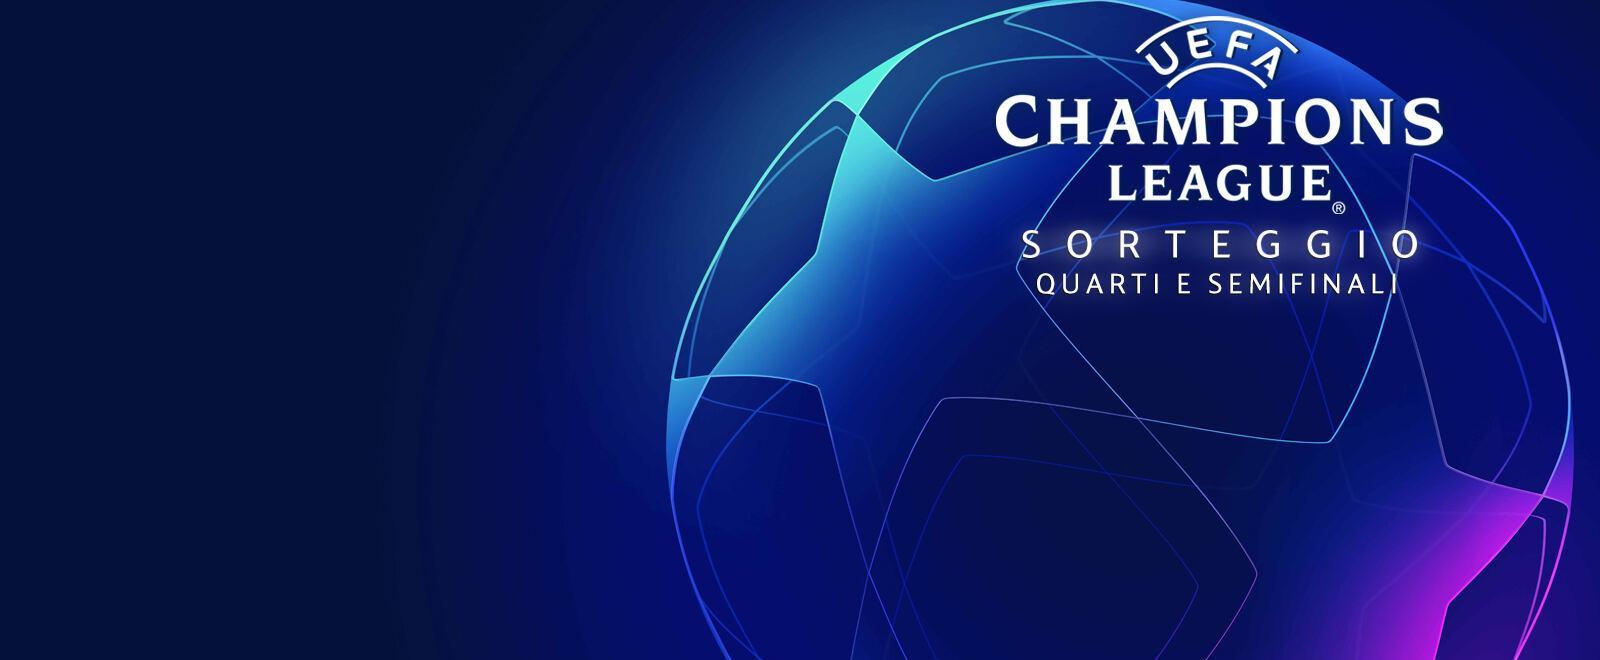 Sorteggio uefa champions league-'20